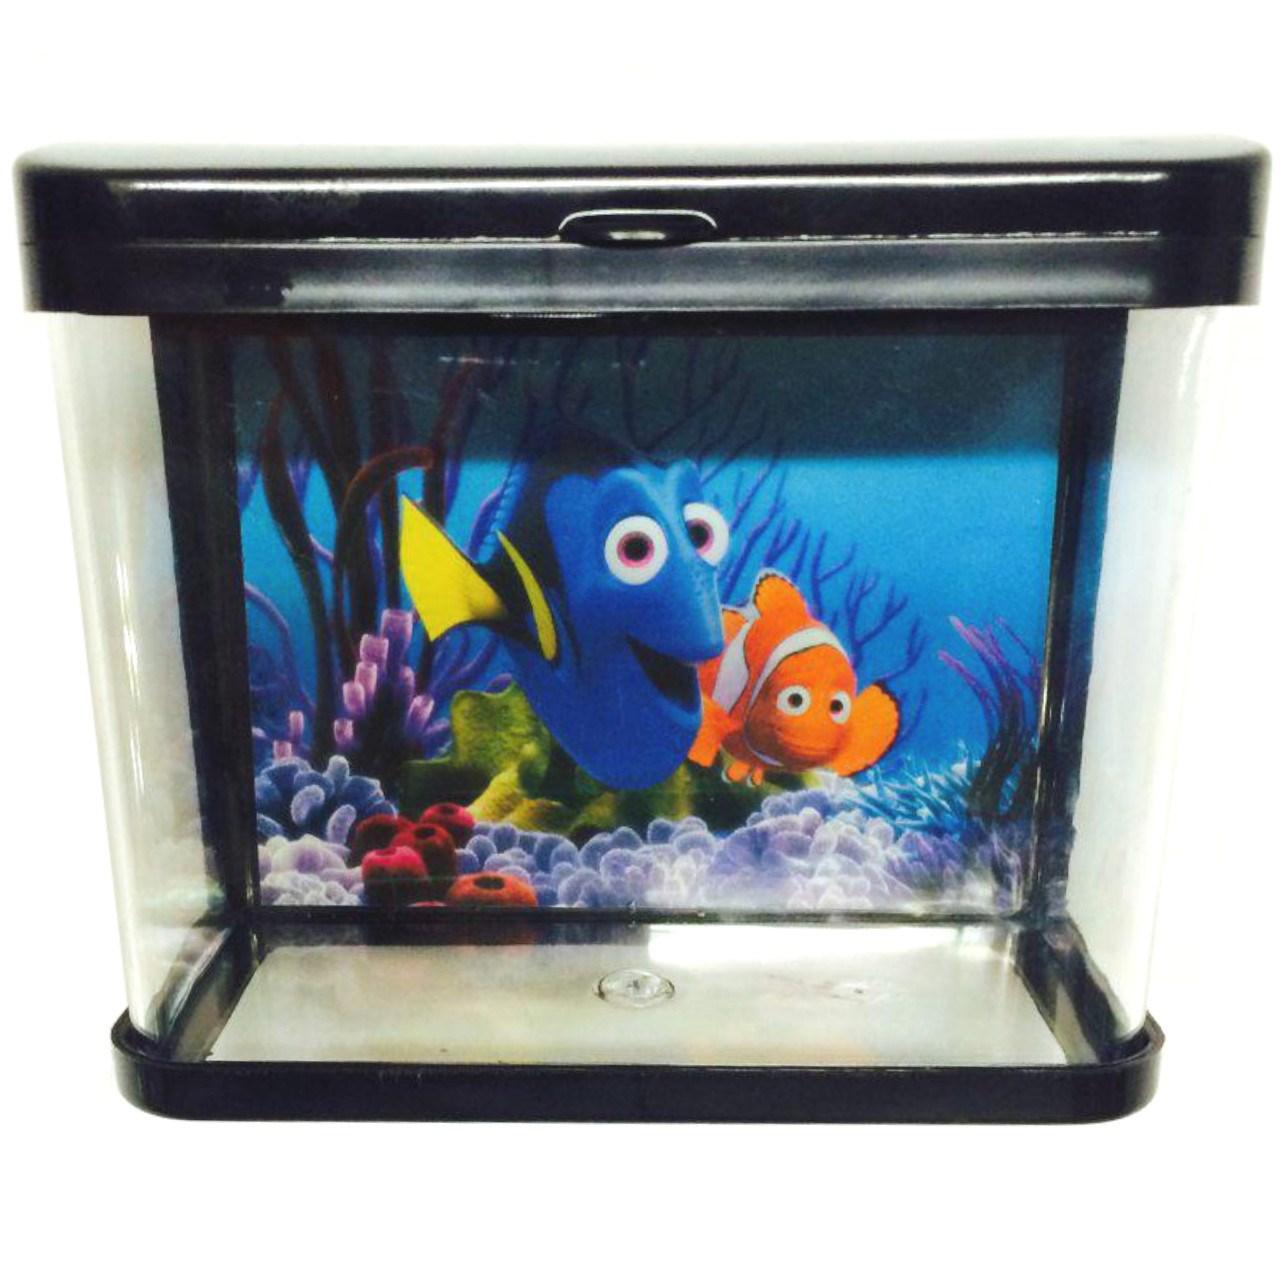 آکواریوم HA مدل Nemo حجم 1.5 لیتر